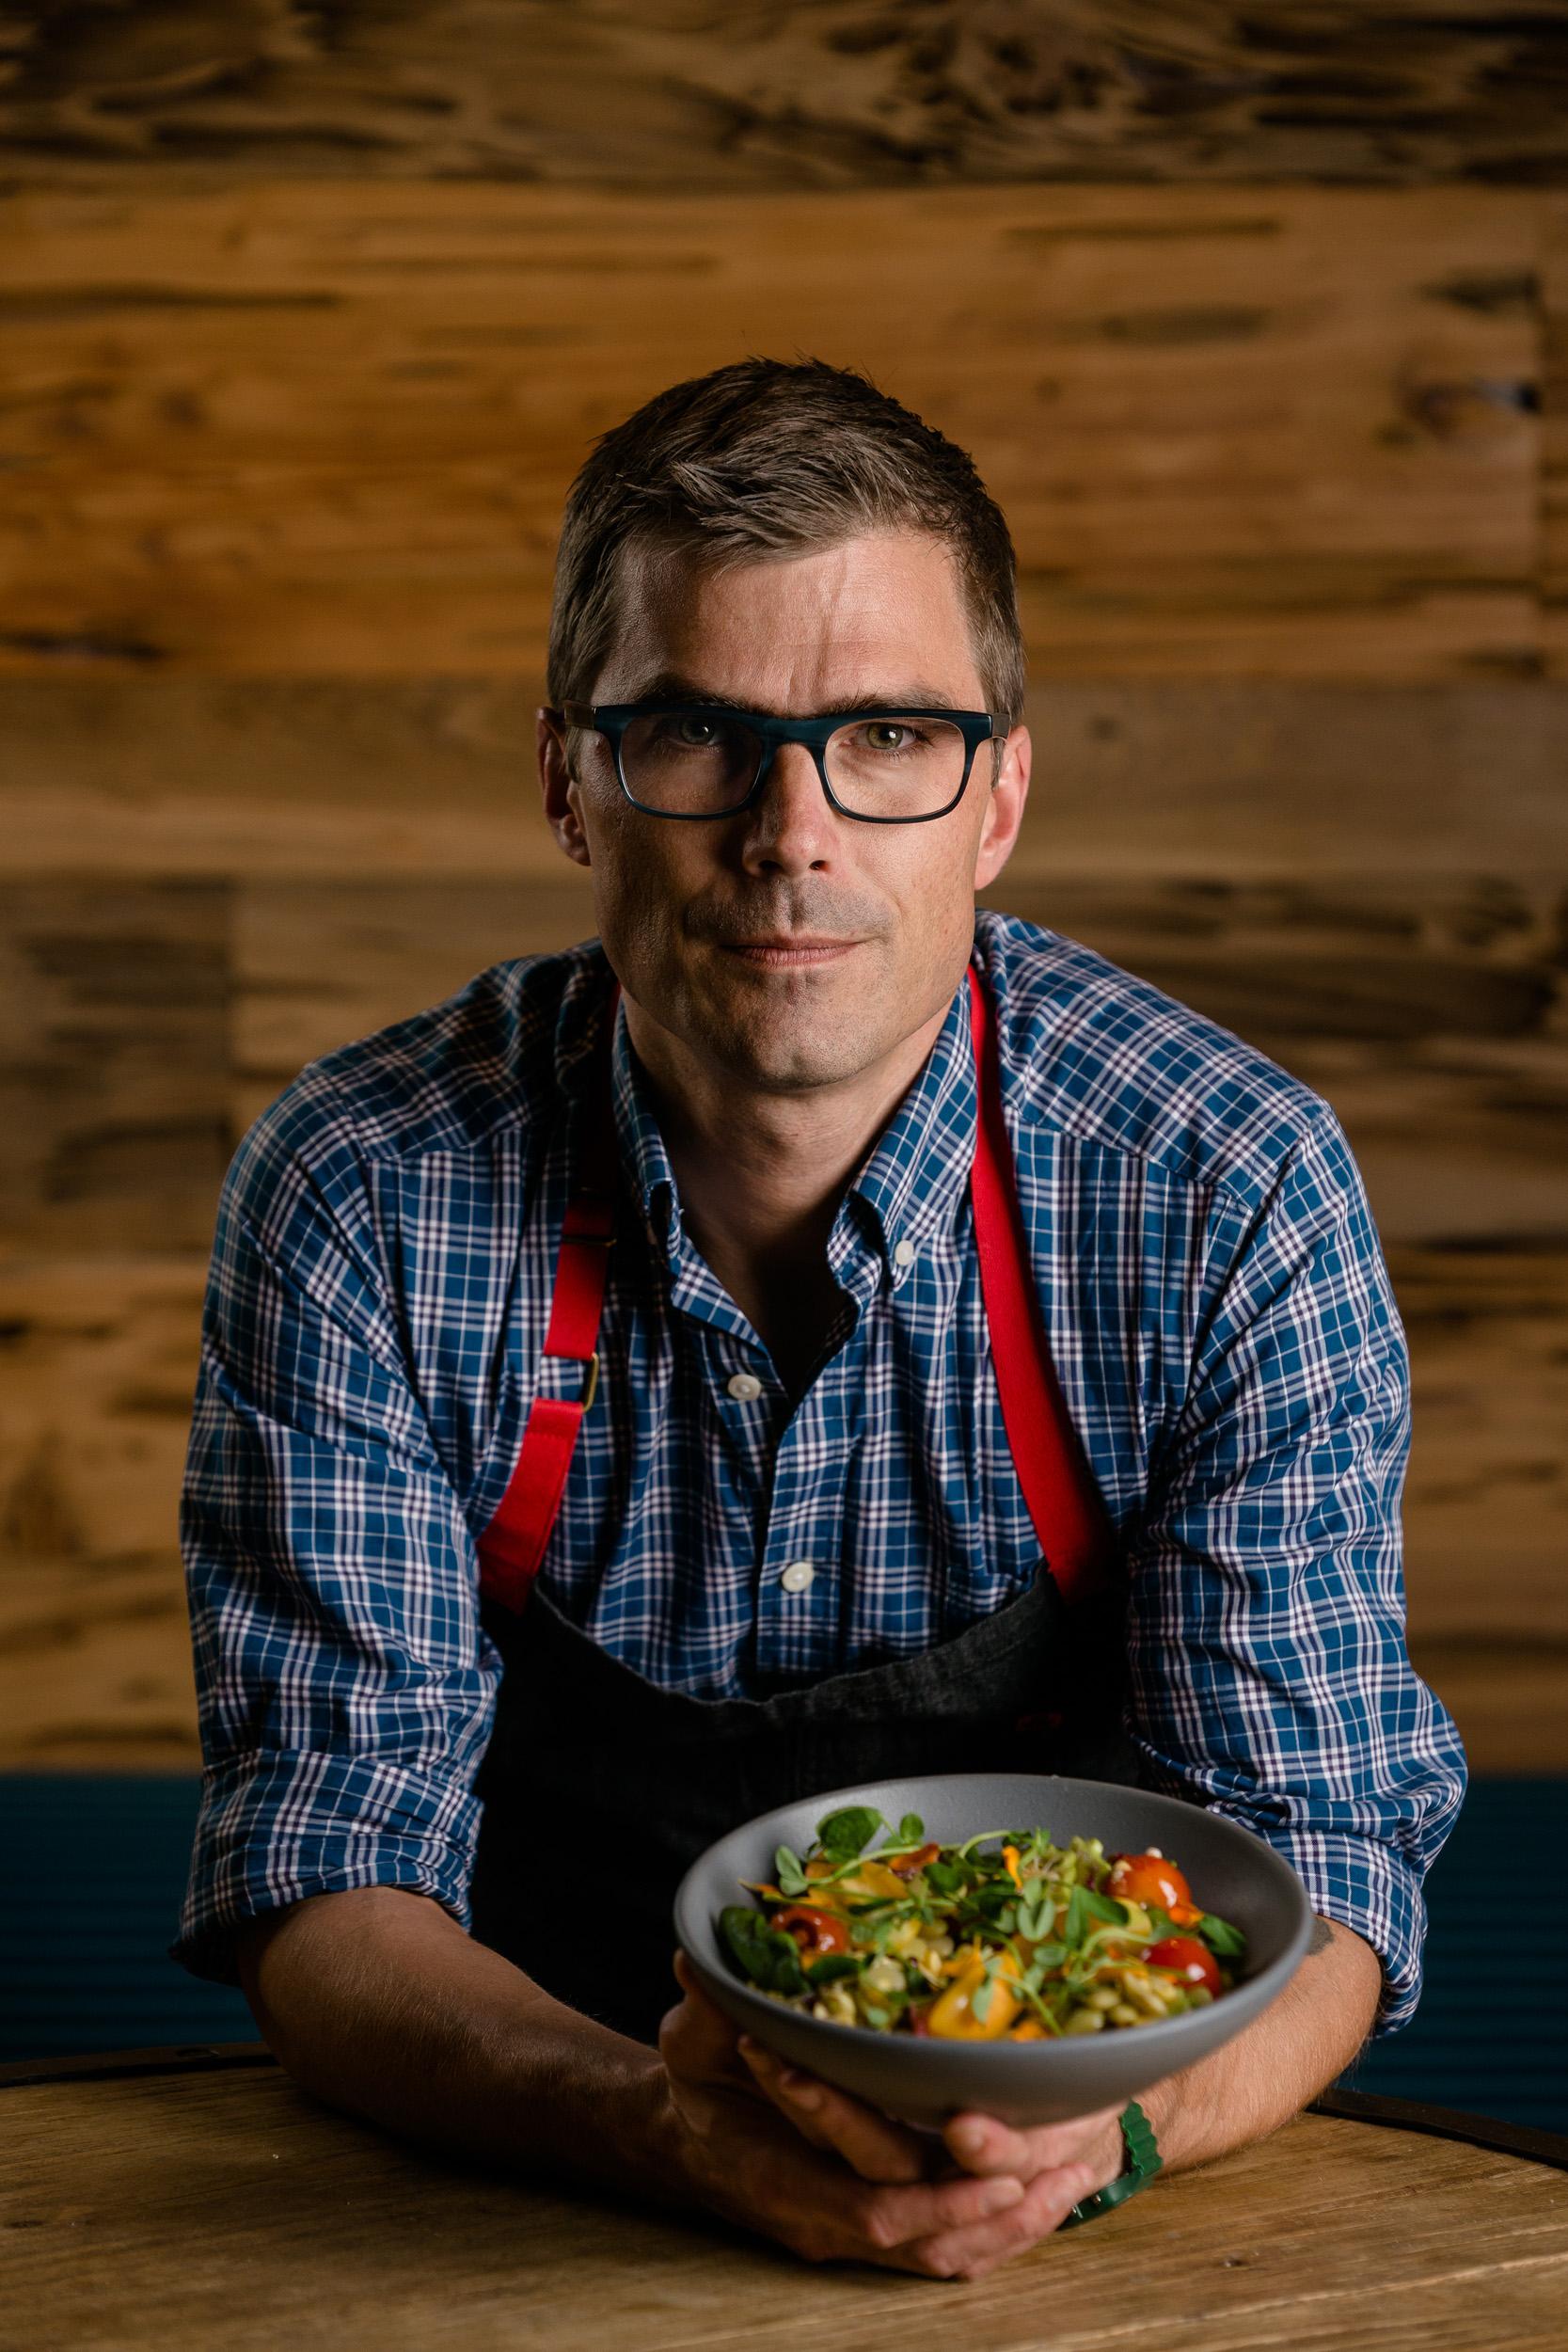 atlanta commercial photography editorial photography restaurant photographer 1004.jpg